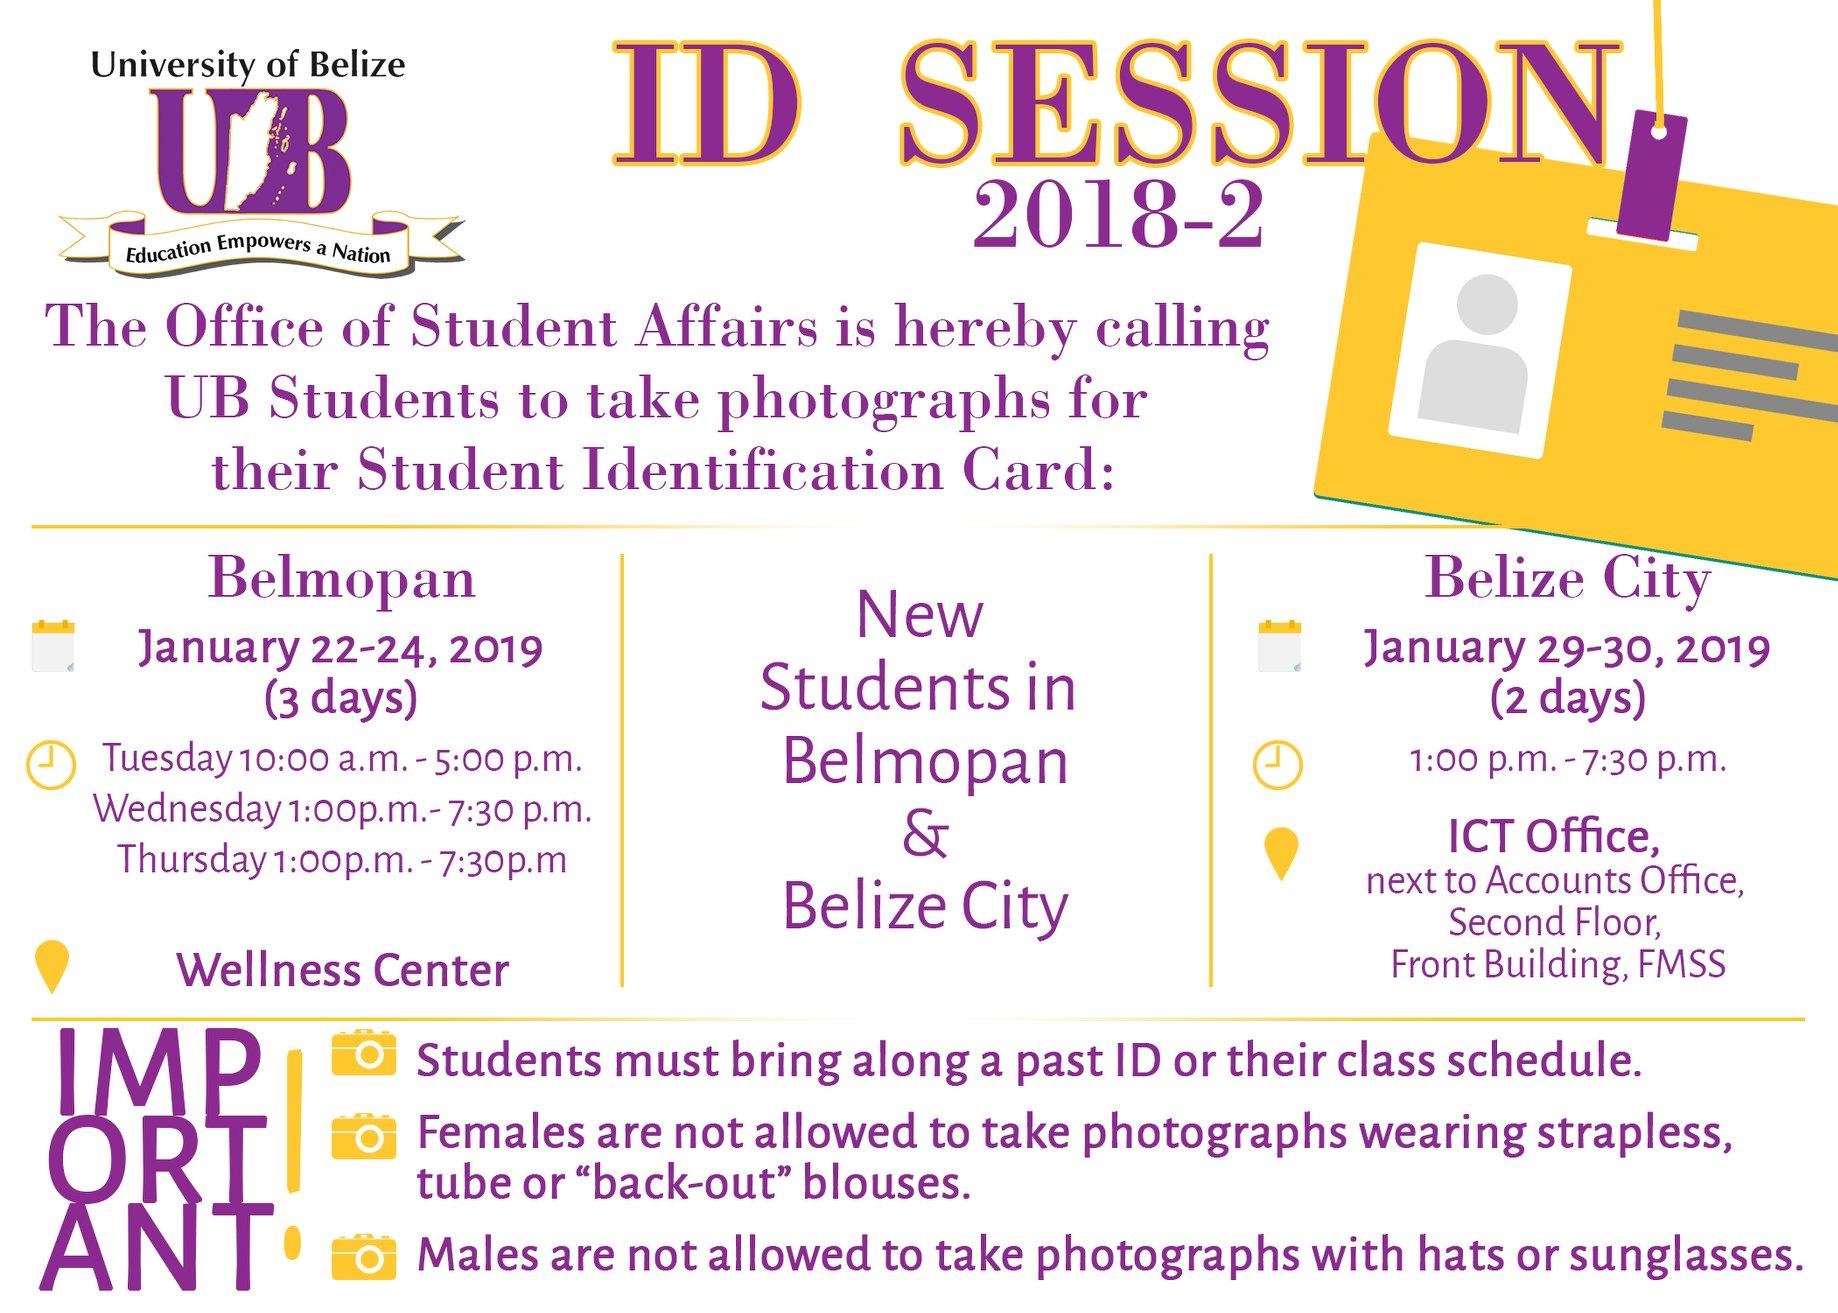 Ub Calendar 2019 ID Session in Belmopan